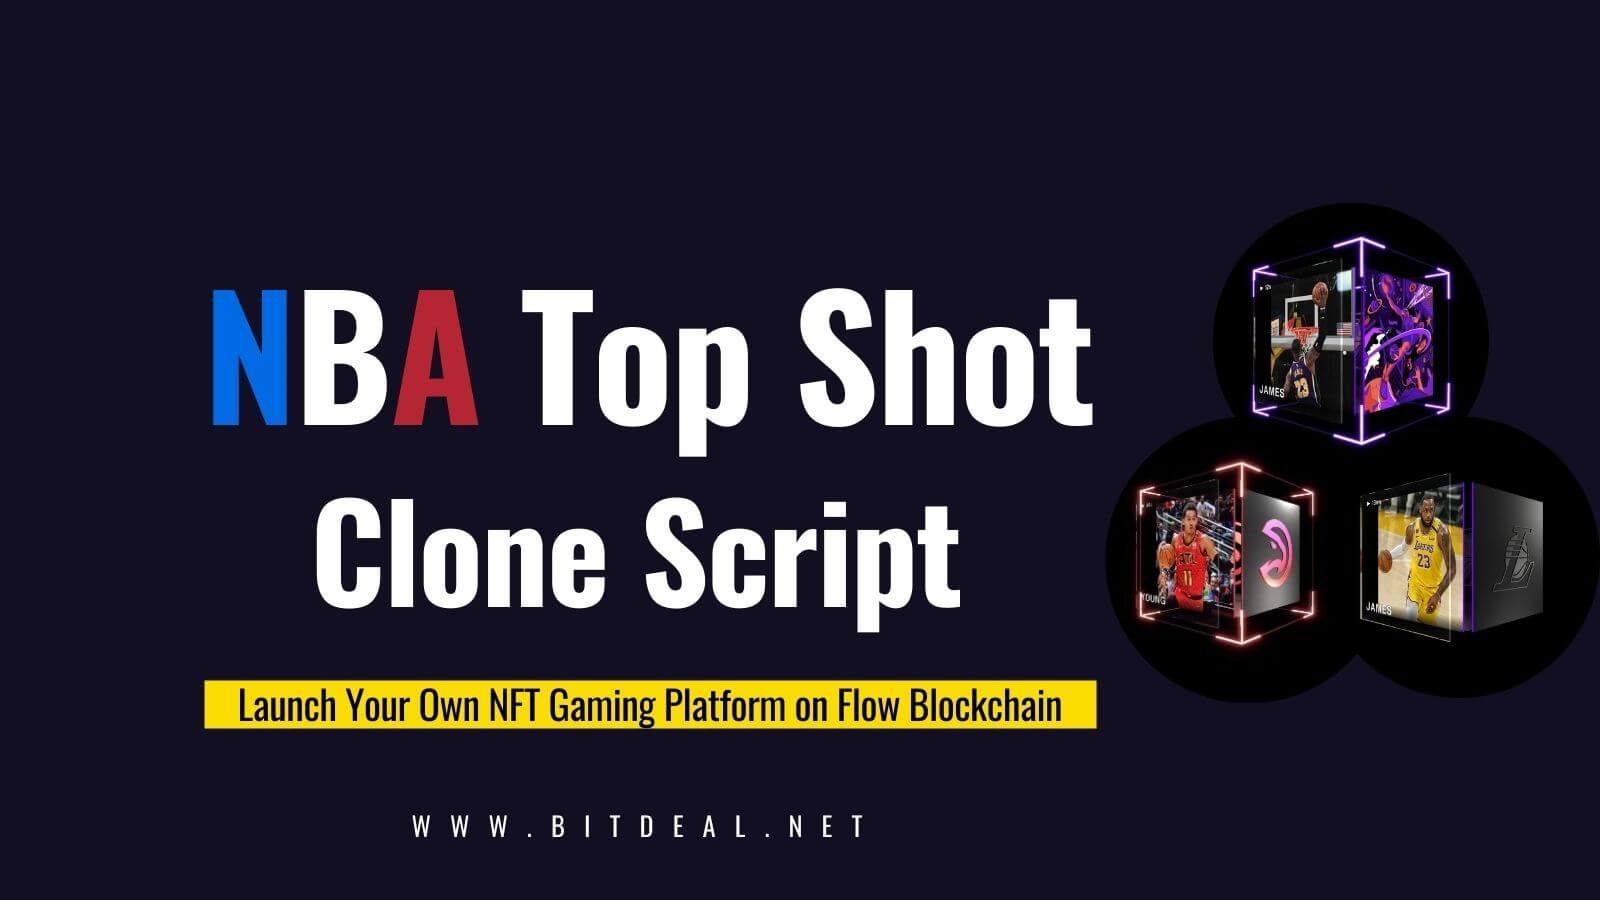 NBA Top Shot Clone Script To Create Digital Collectible NFT Marketplace